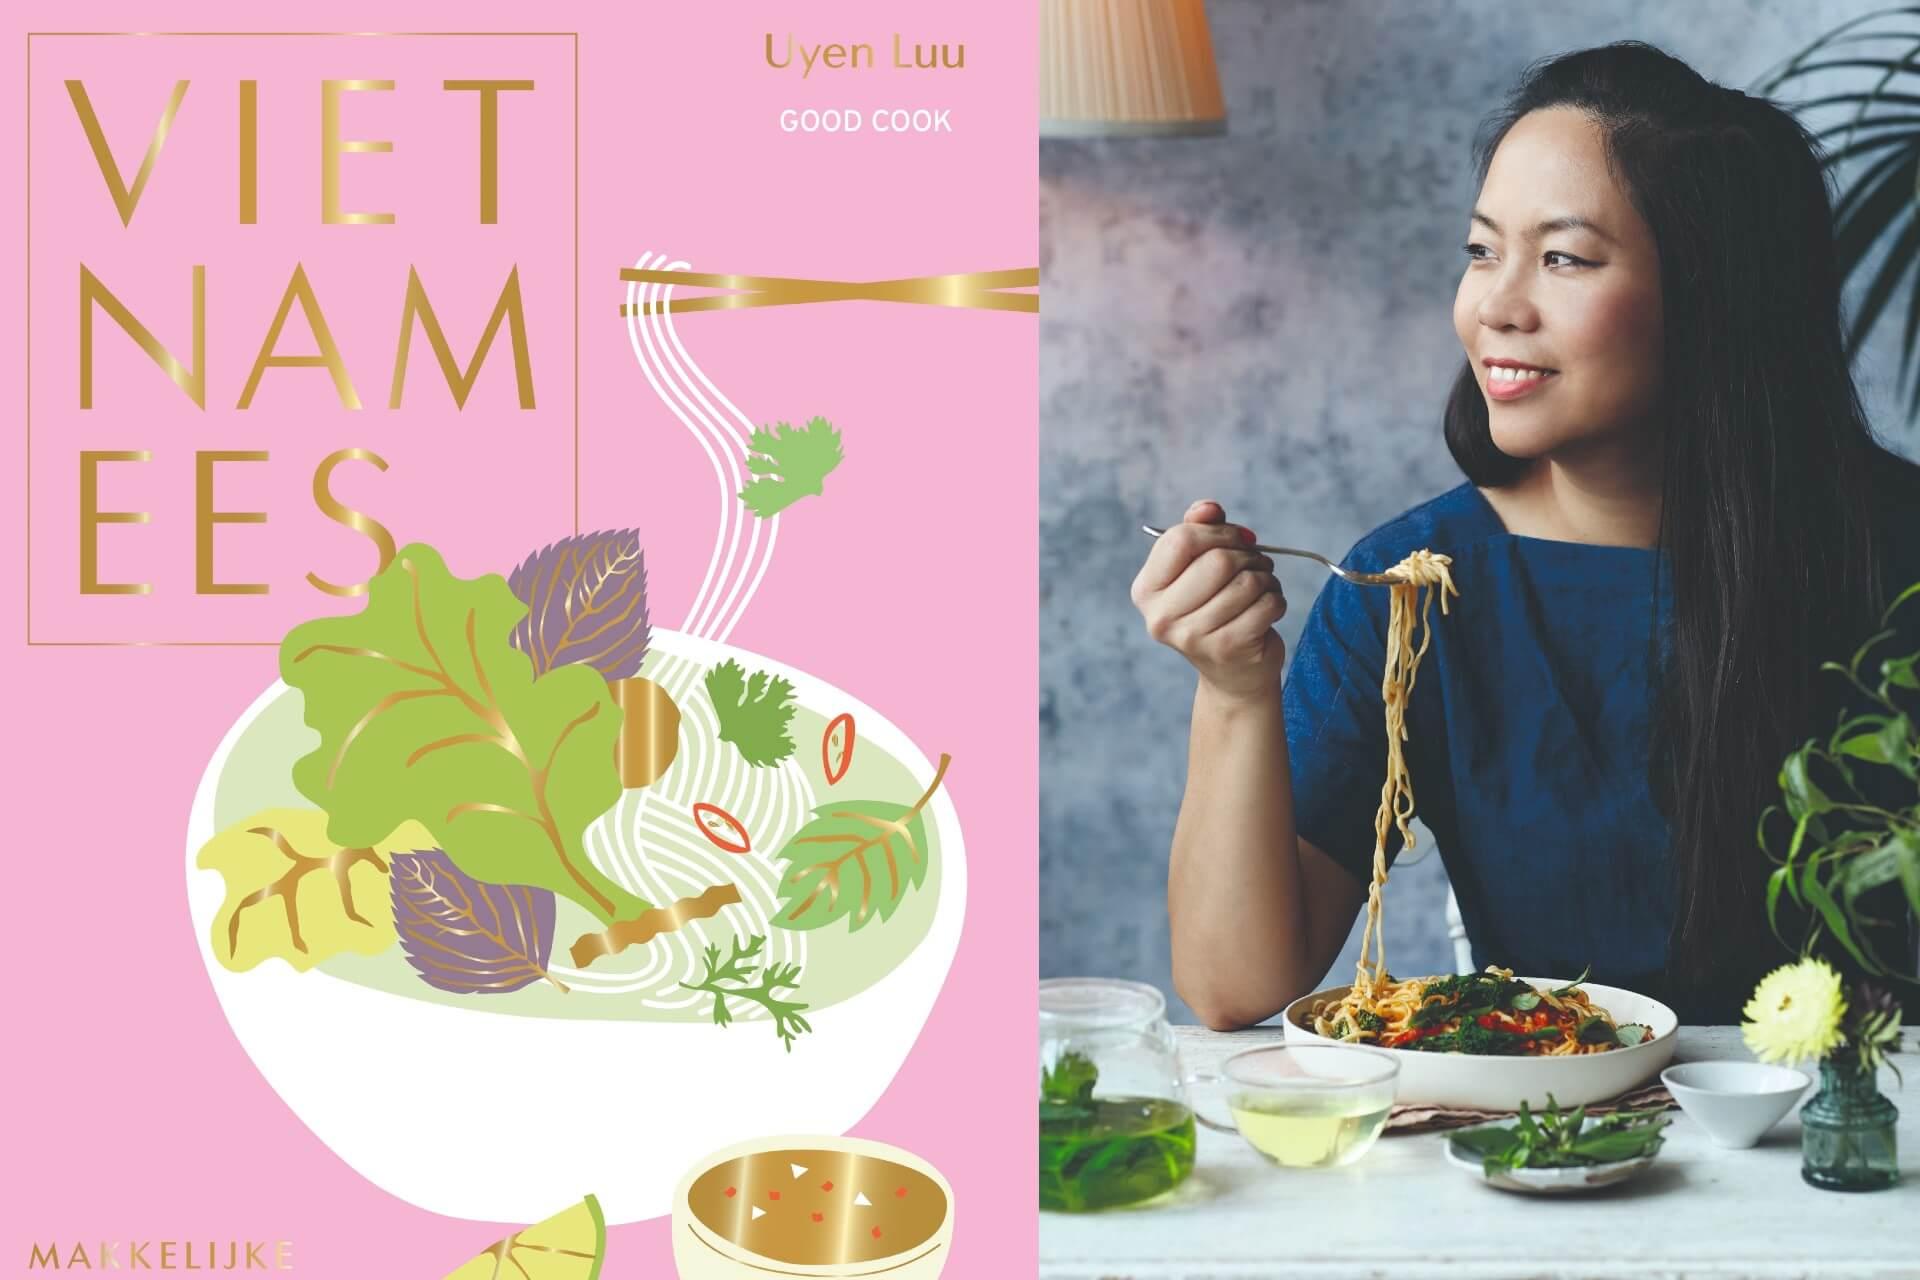 Wereldkeuken: de Vietnamese keuken